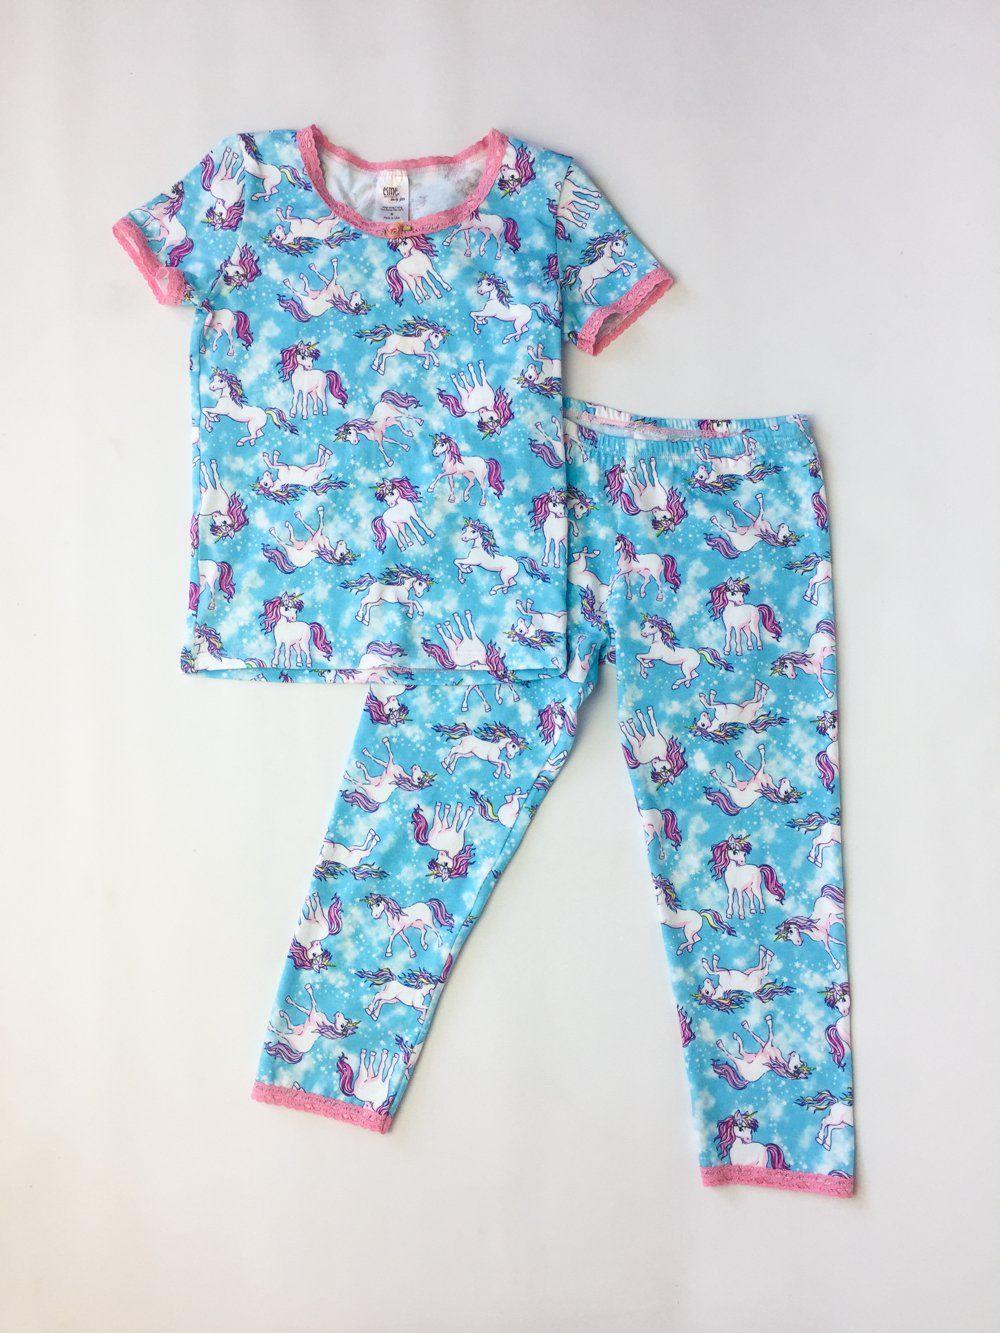 9bb91b6c9 Esme Unicorn Girl s Sleepwear Short Sleeve Top Leggings set ...